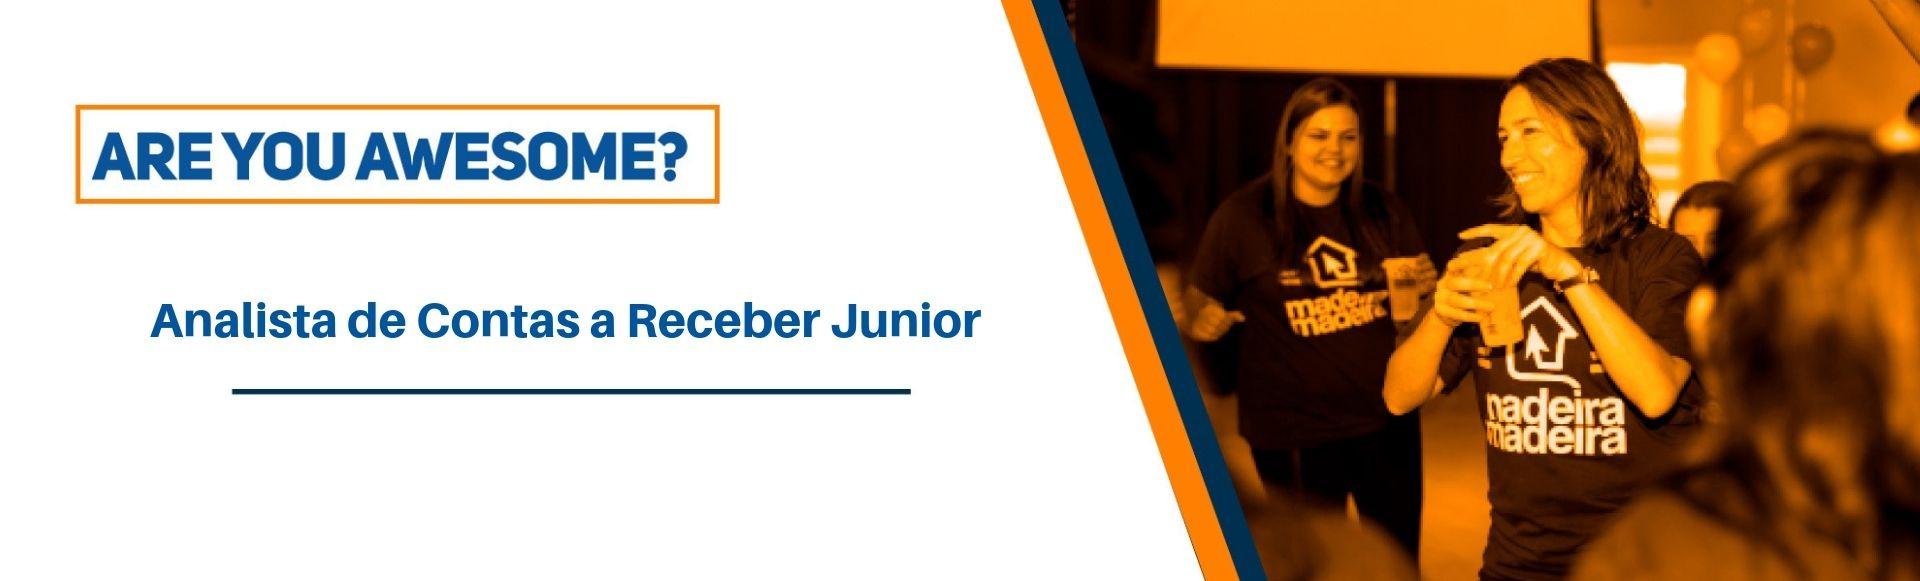 Analista de Contas a Receber Junior